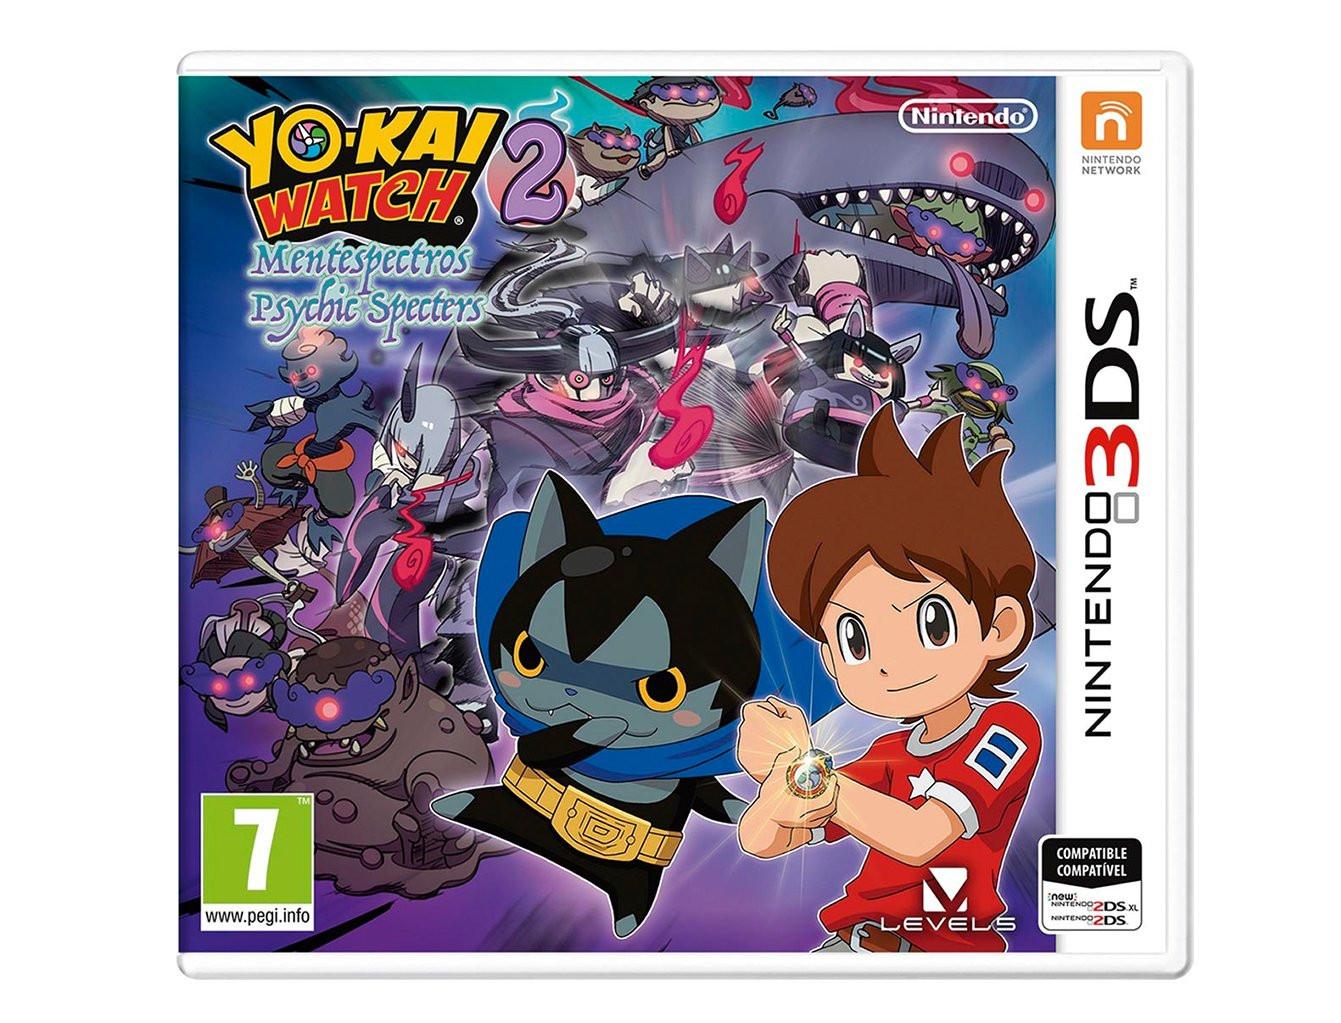 Yo Kai Watch 2 Mentespectros Nintendo 2ds 3ds Juegos 2ds 3ds